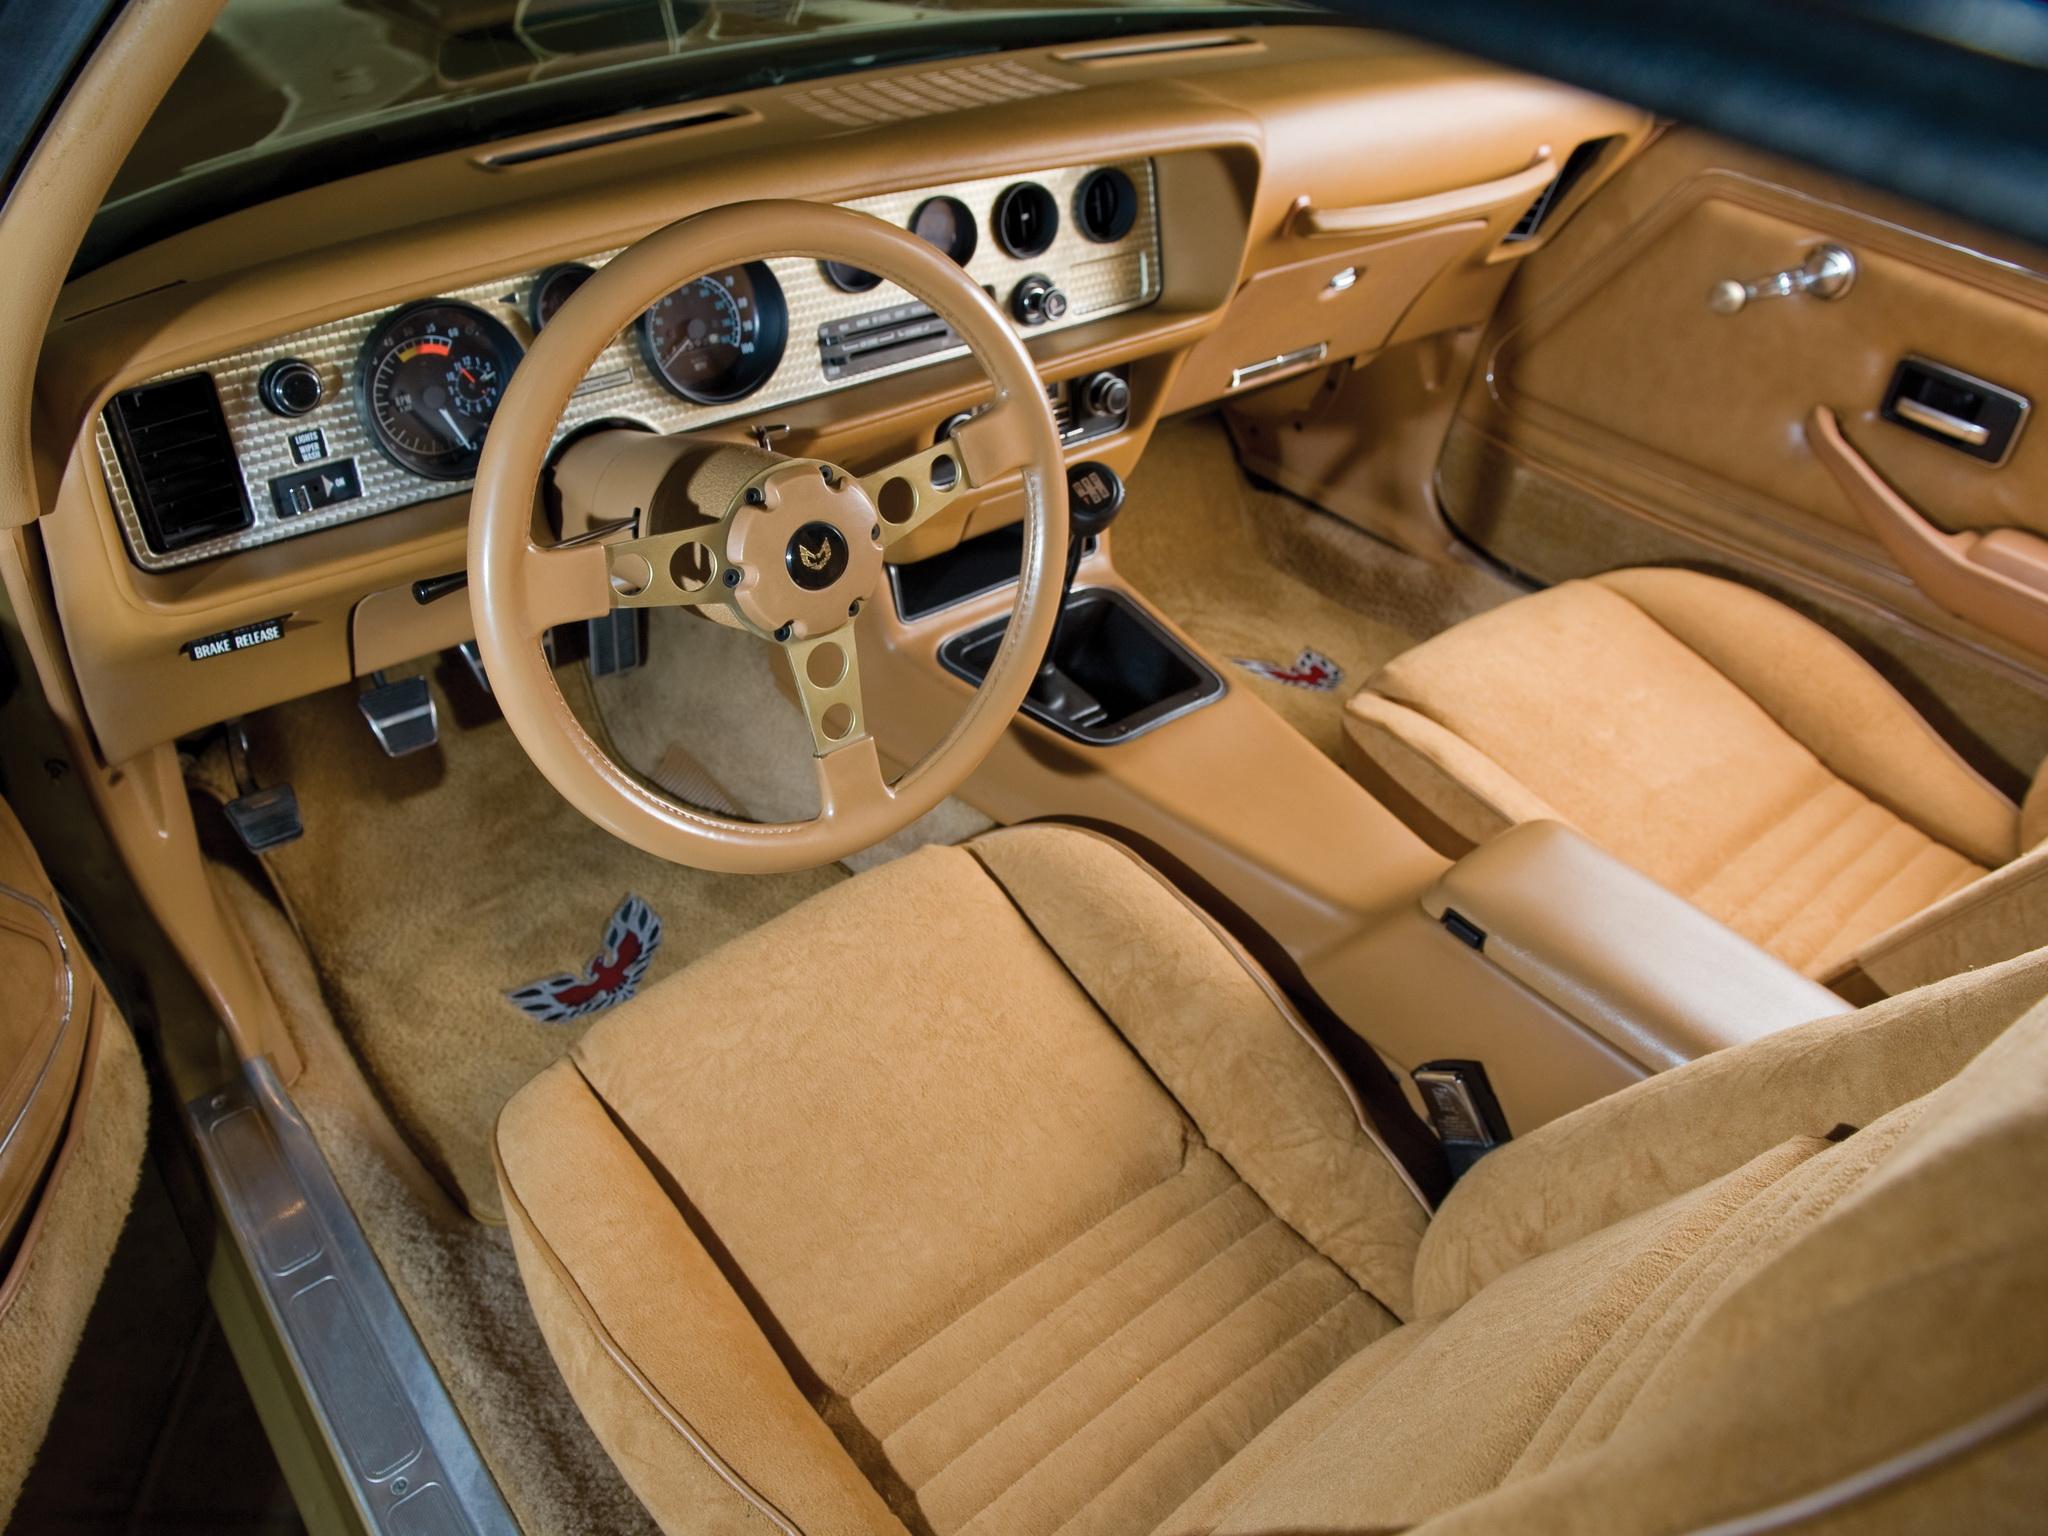 1978 Pontiac Firebird Trans Am Trans A M Muscle Classic Interior Wallpaper 2048x1536 94060